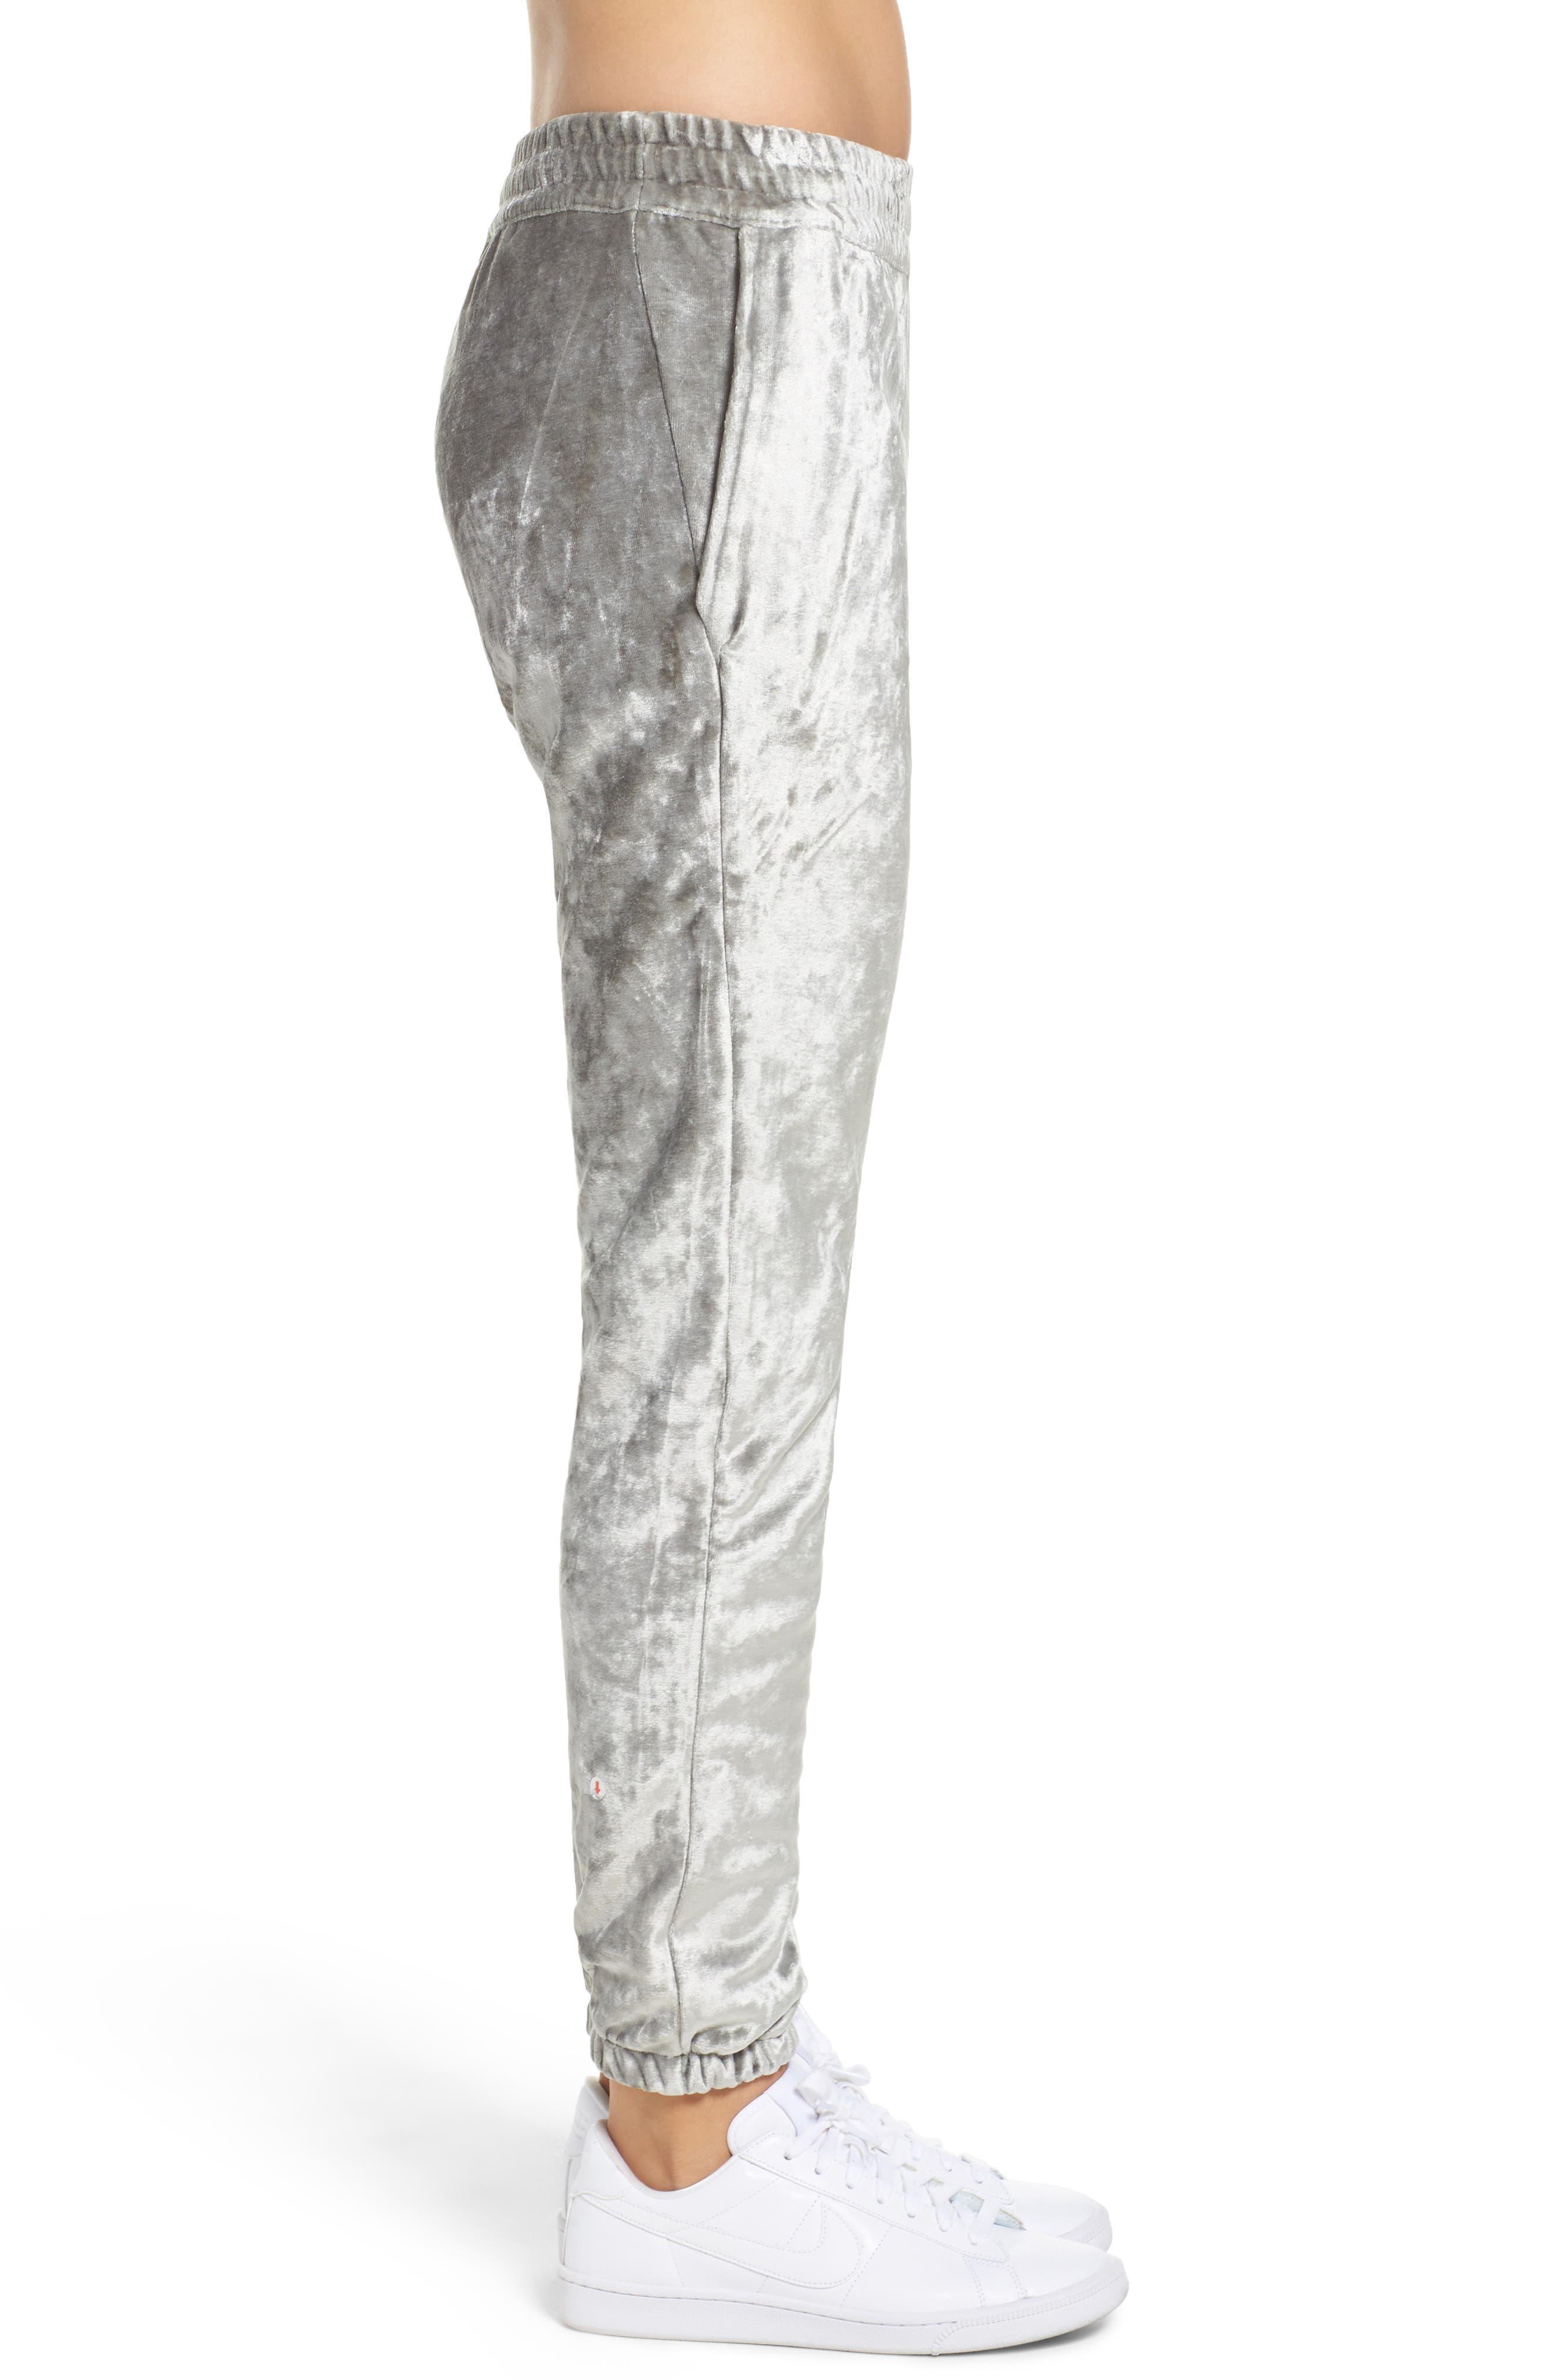 NIKE,                             NikeLab Essentials Women's Velour Pants,                             Alternate thumbnail 3, color,                             020